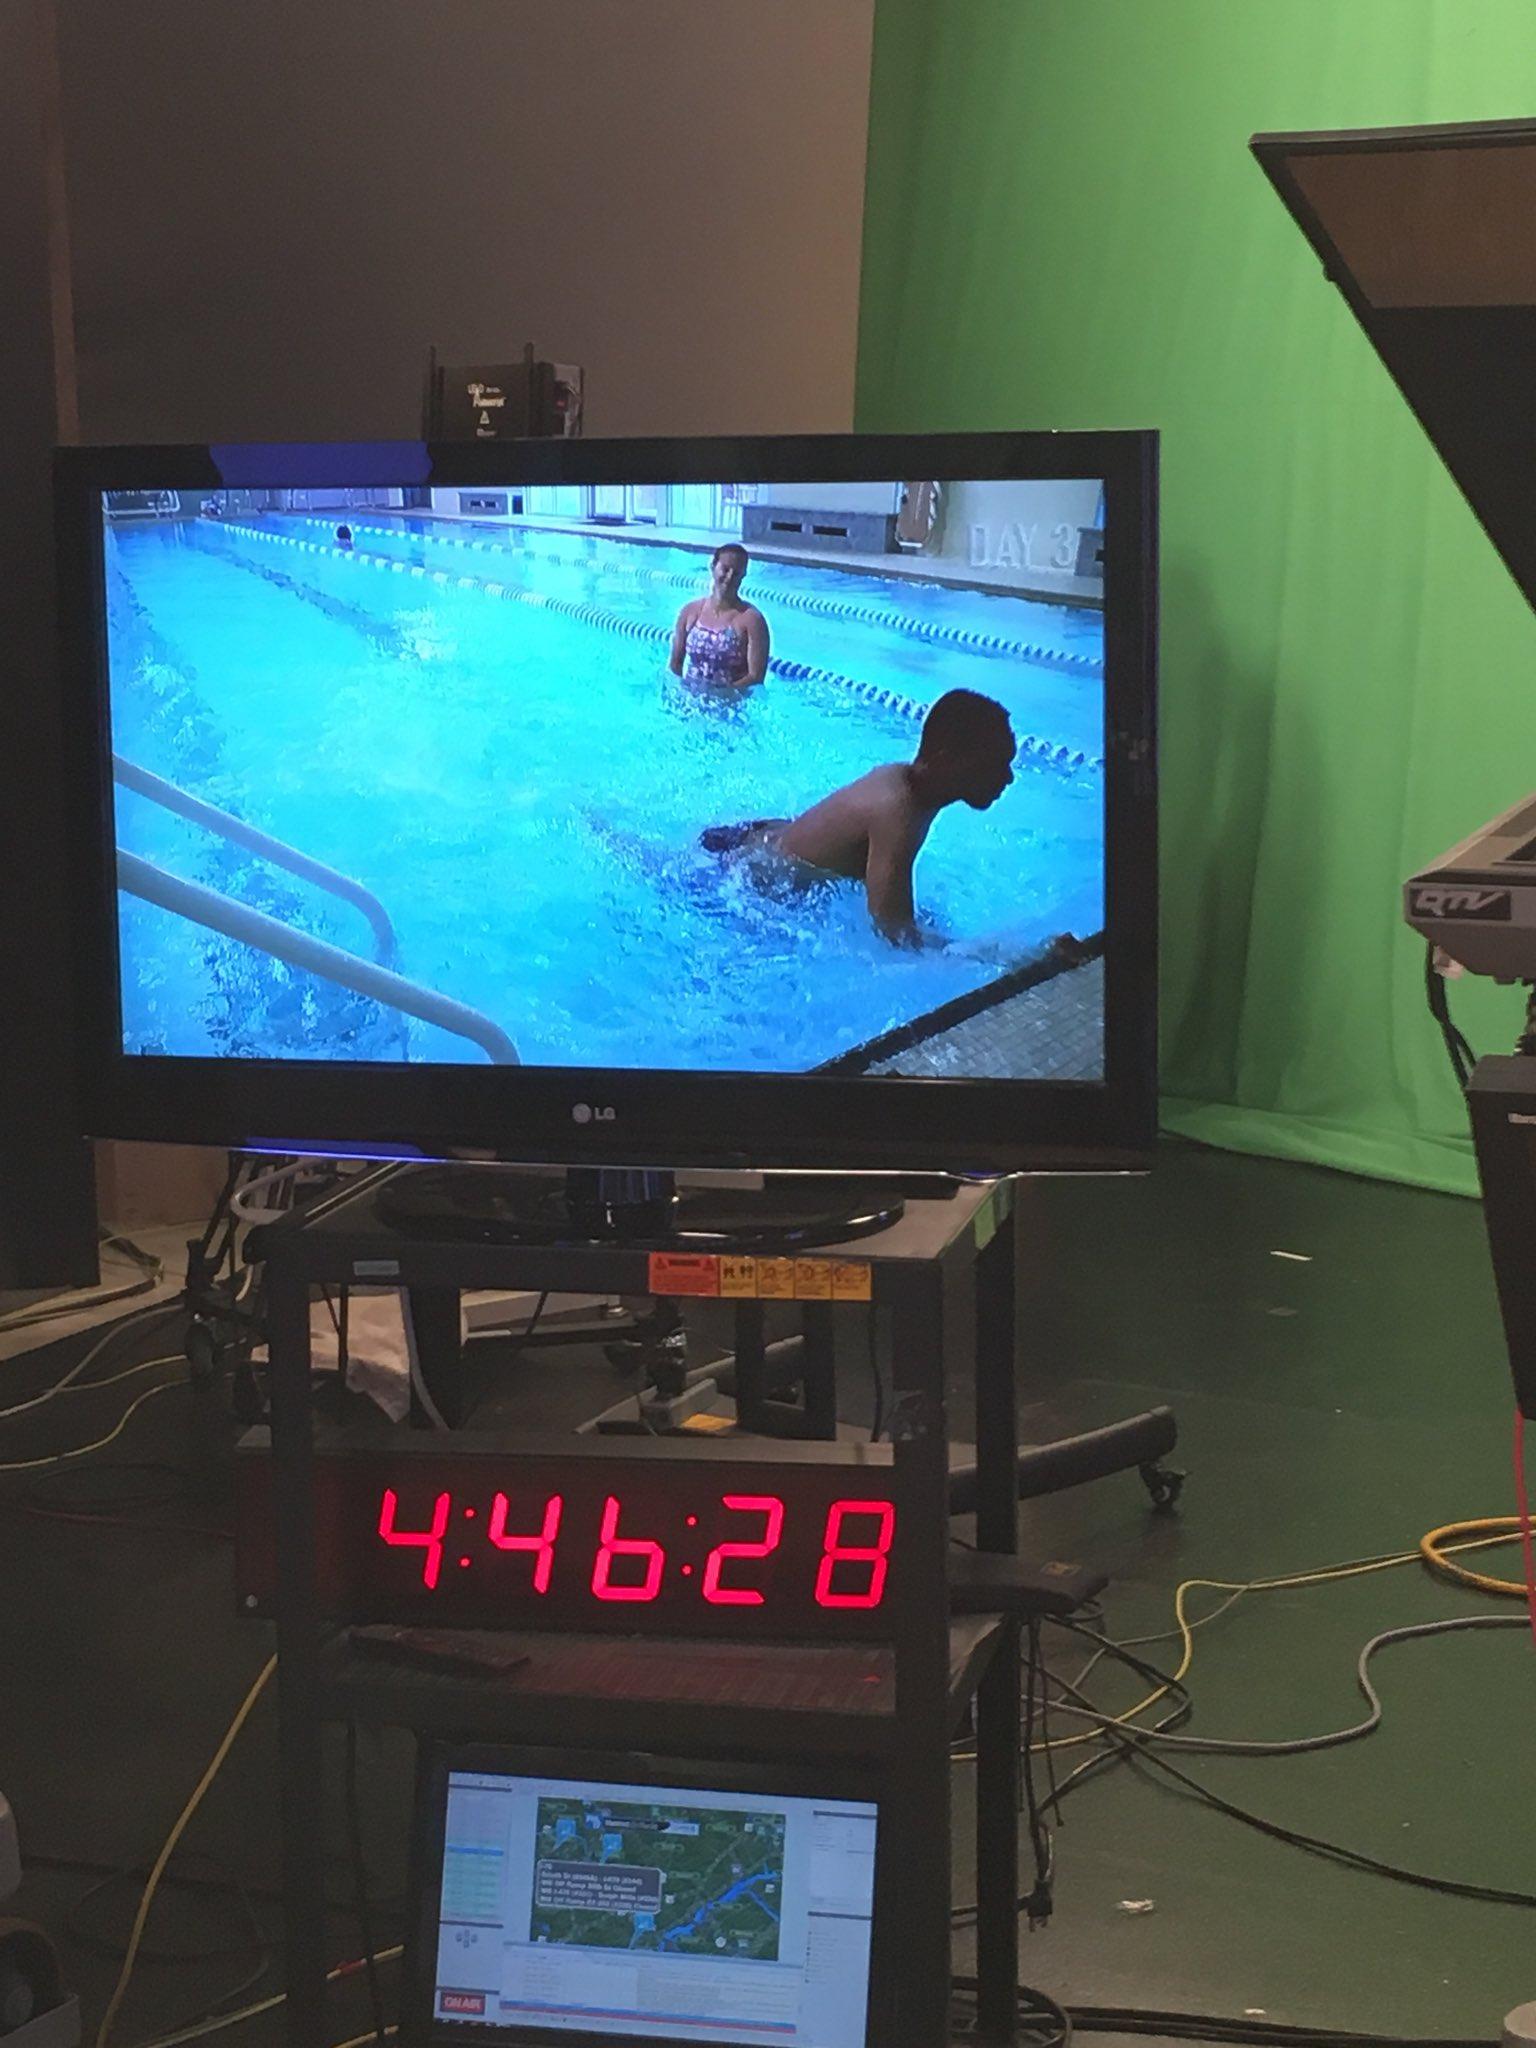 I think I did pretty good! #swimming #philly #Philadelphia @USASwimming https://t.co/si41f5cqGg